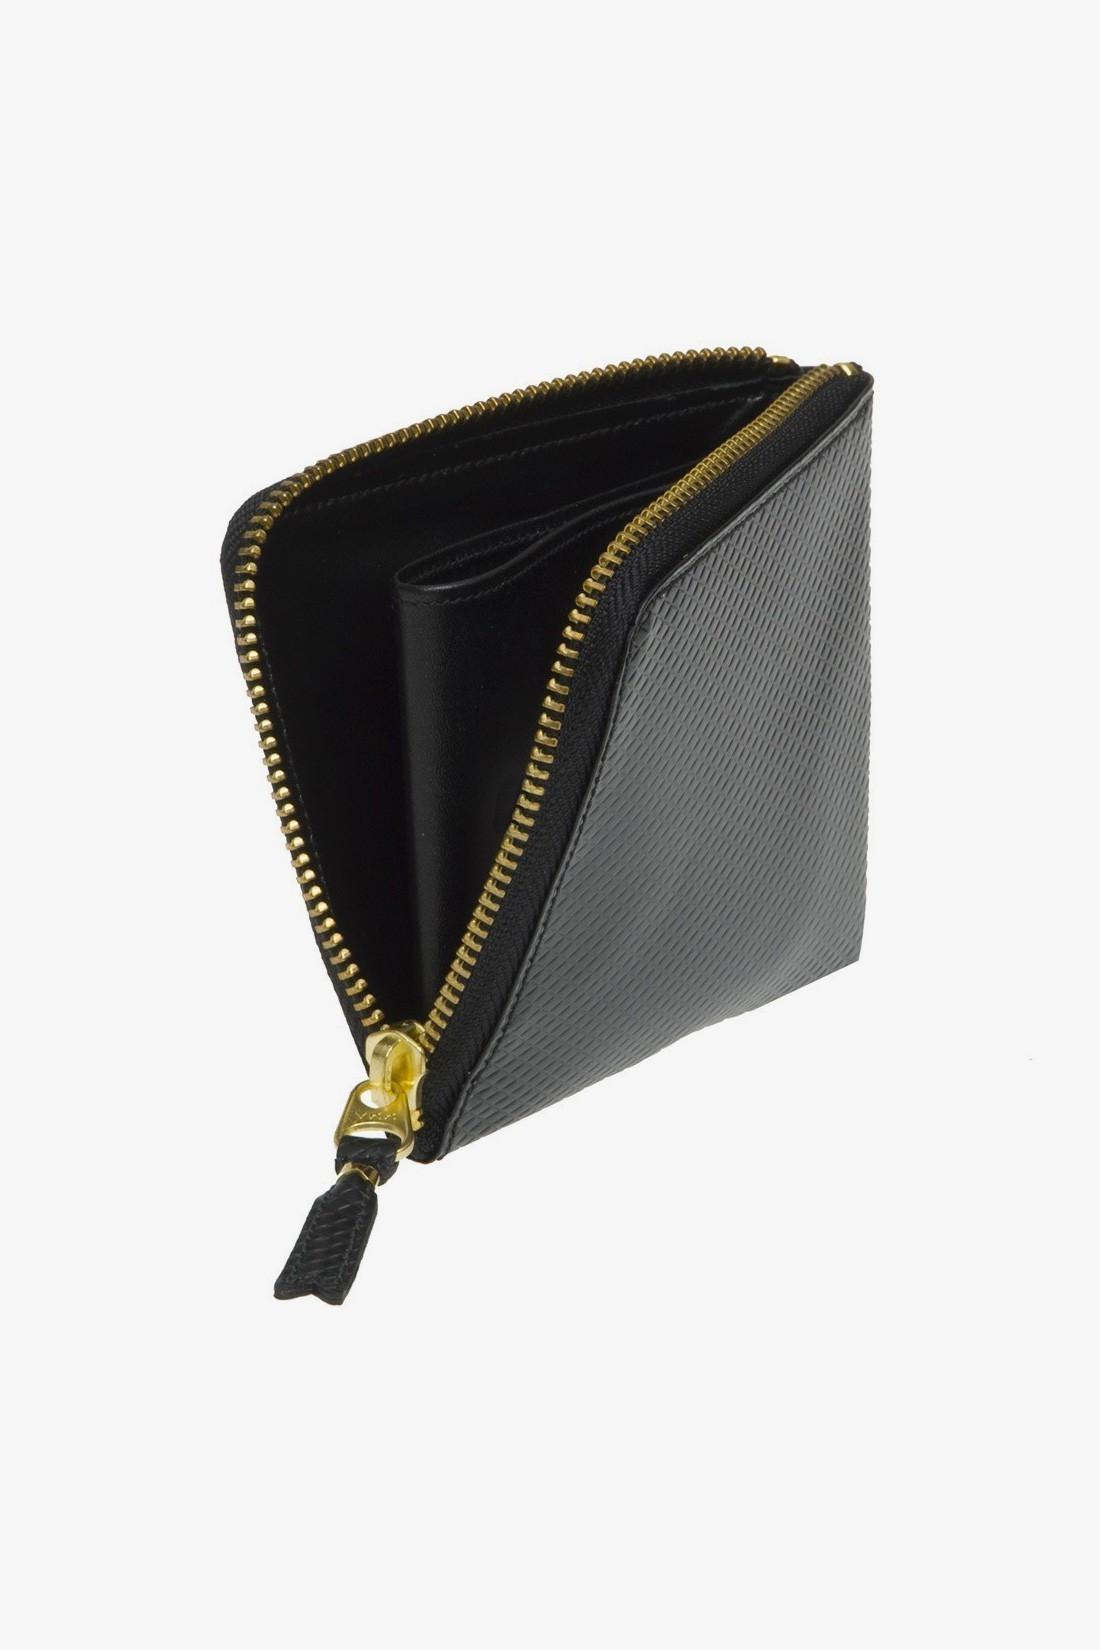 COMME DES GARÇONS WALLETS / Cdg luxury group sa3100lg Black